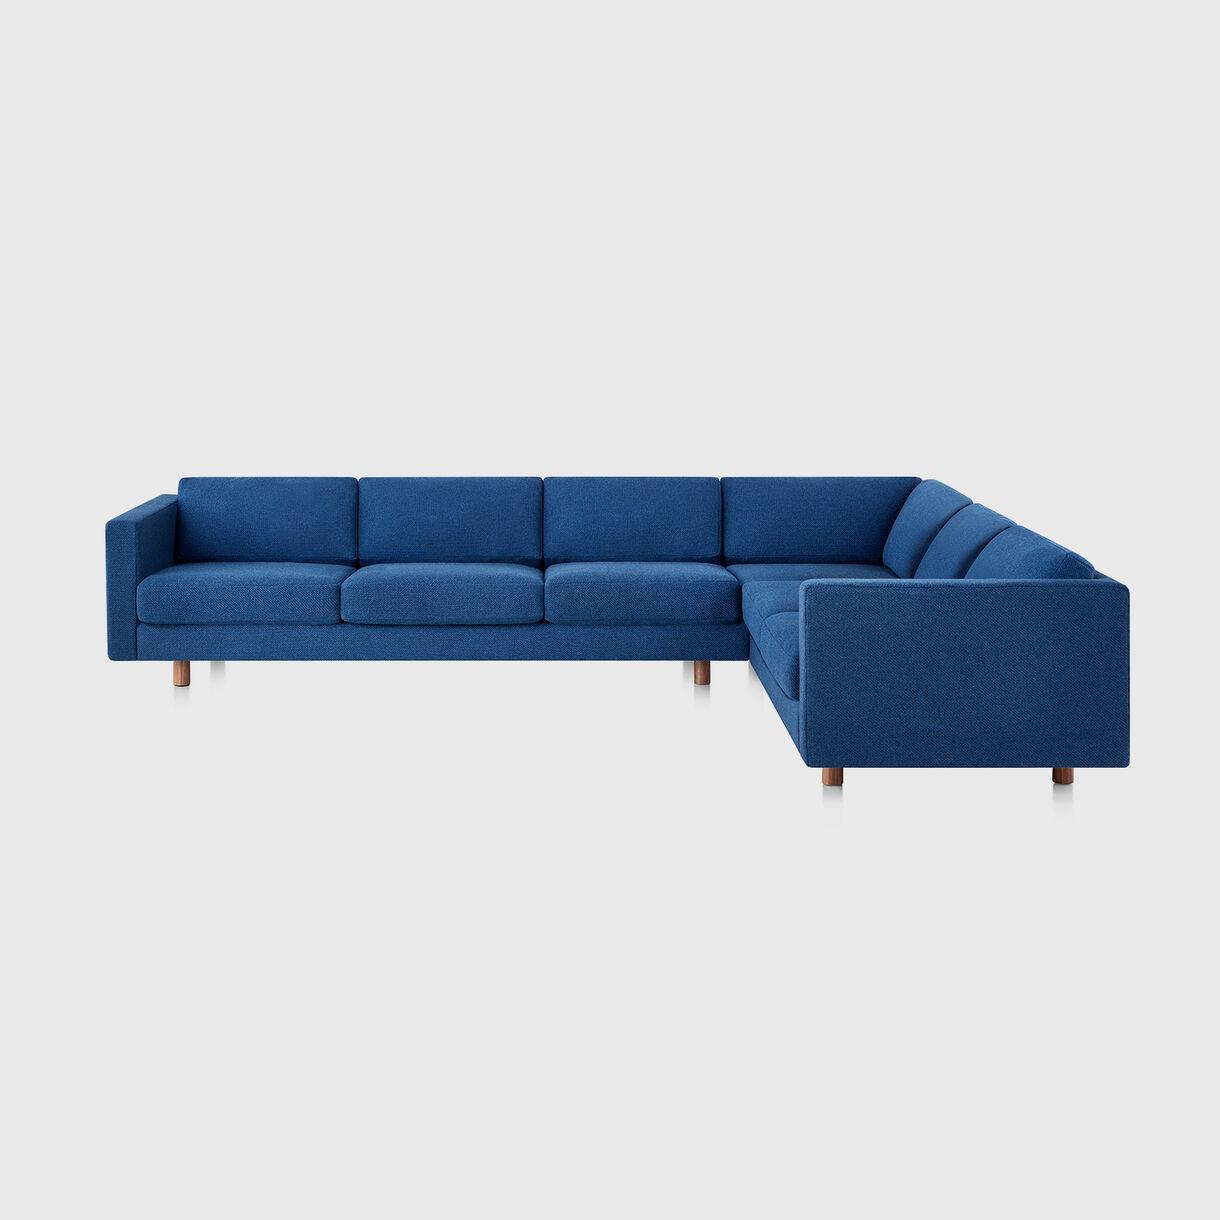 Lispenard Sectional Sofa, Right Configuration, Superweave Marine